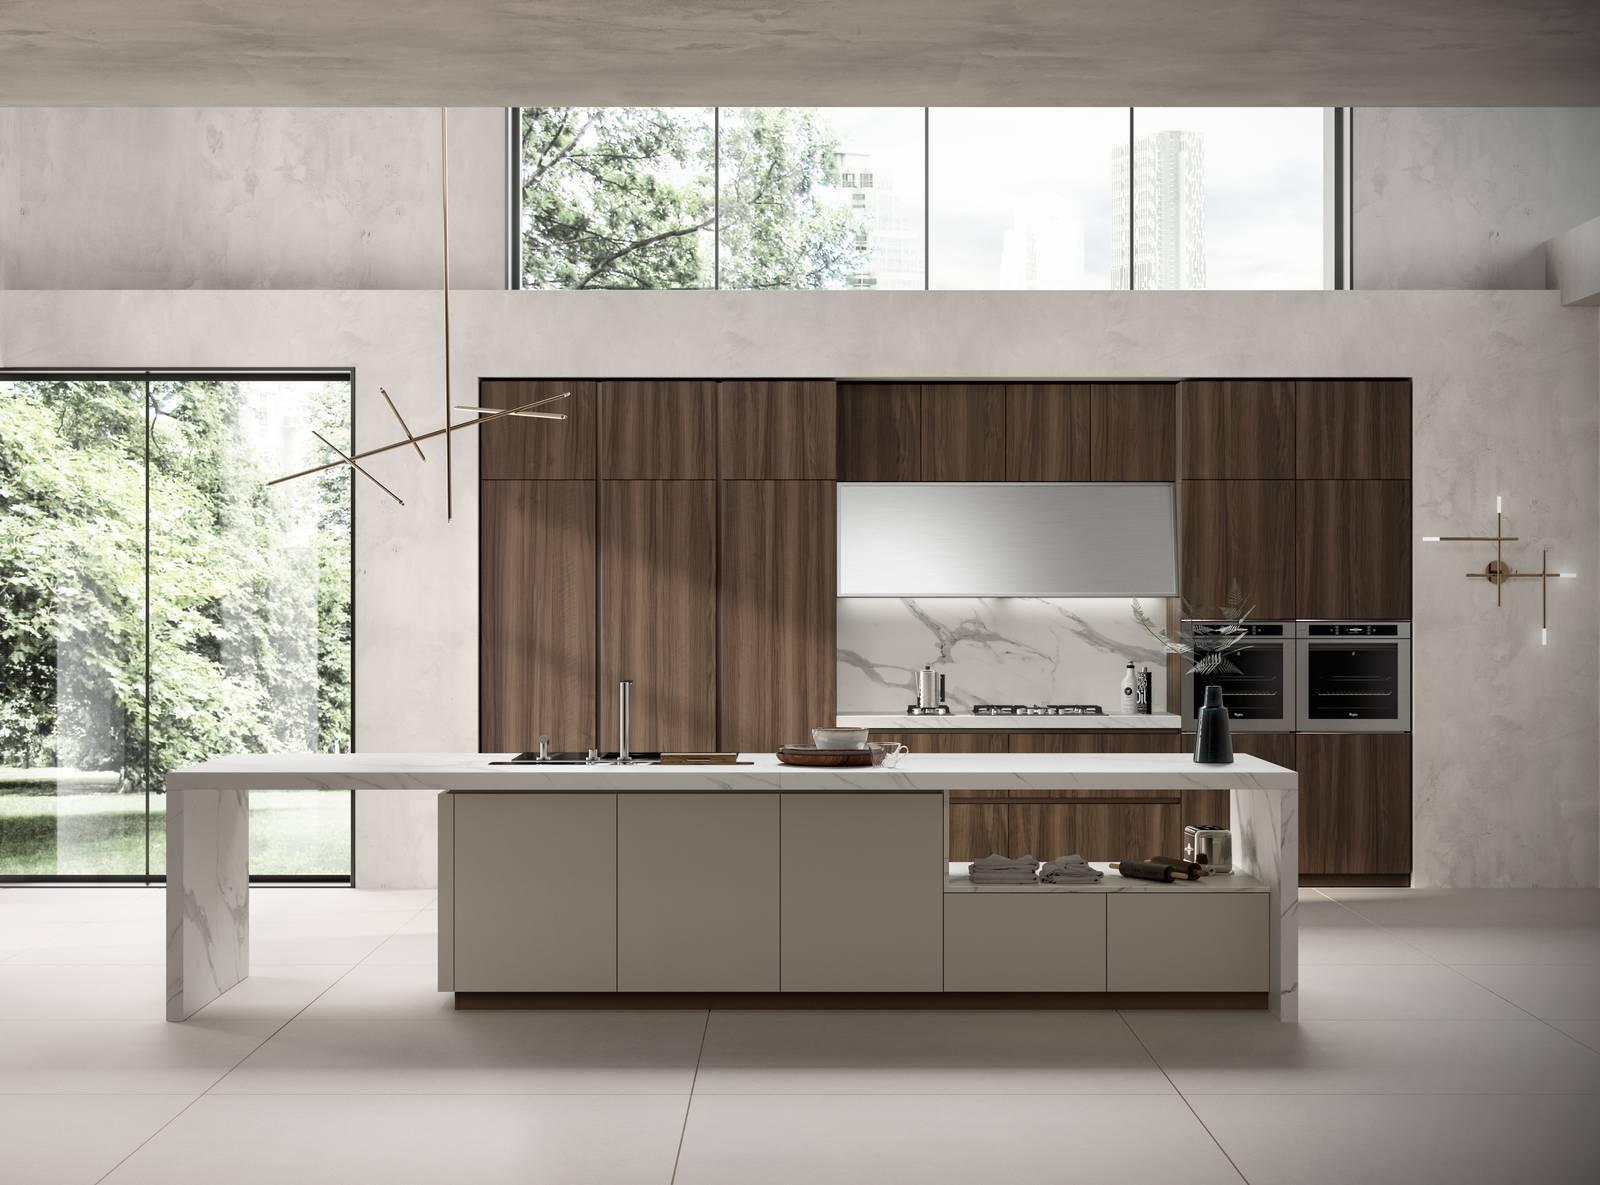 Cucina su misura anche di produzione cose di casa - Top cucina su misura ...